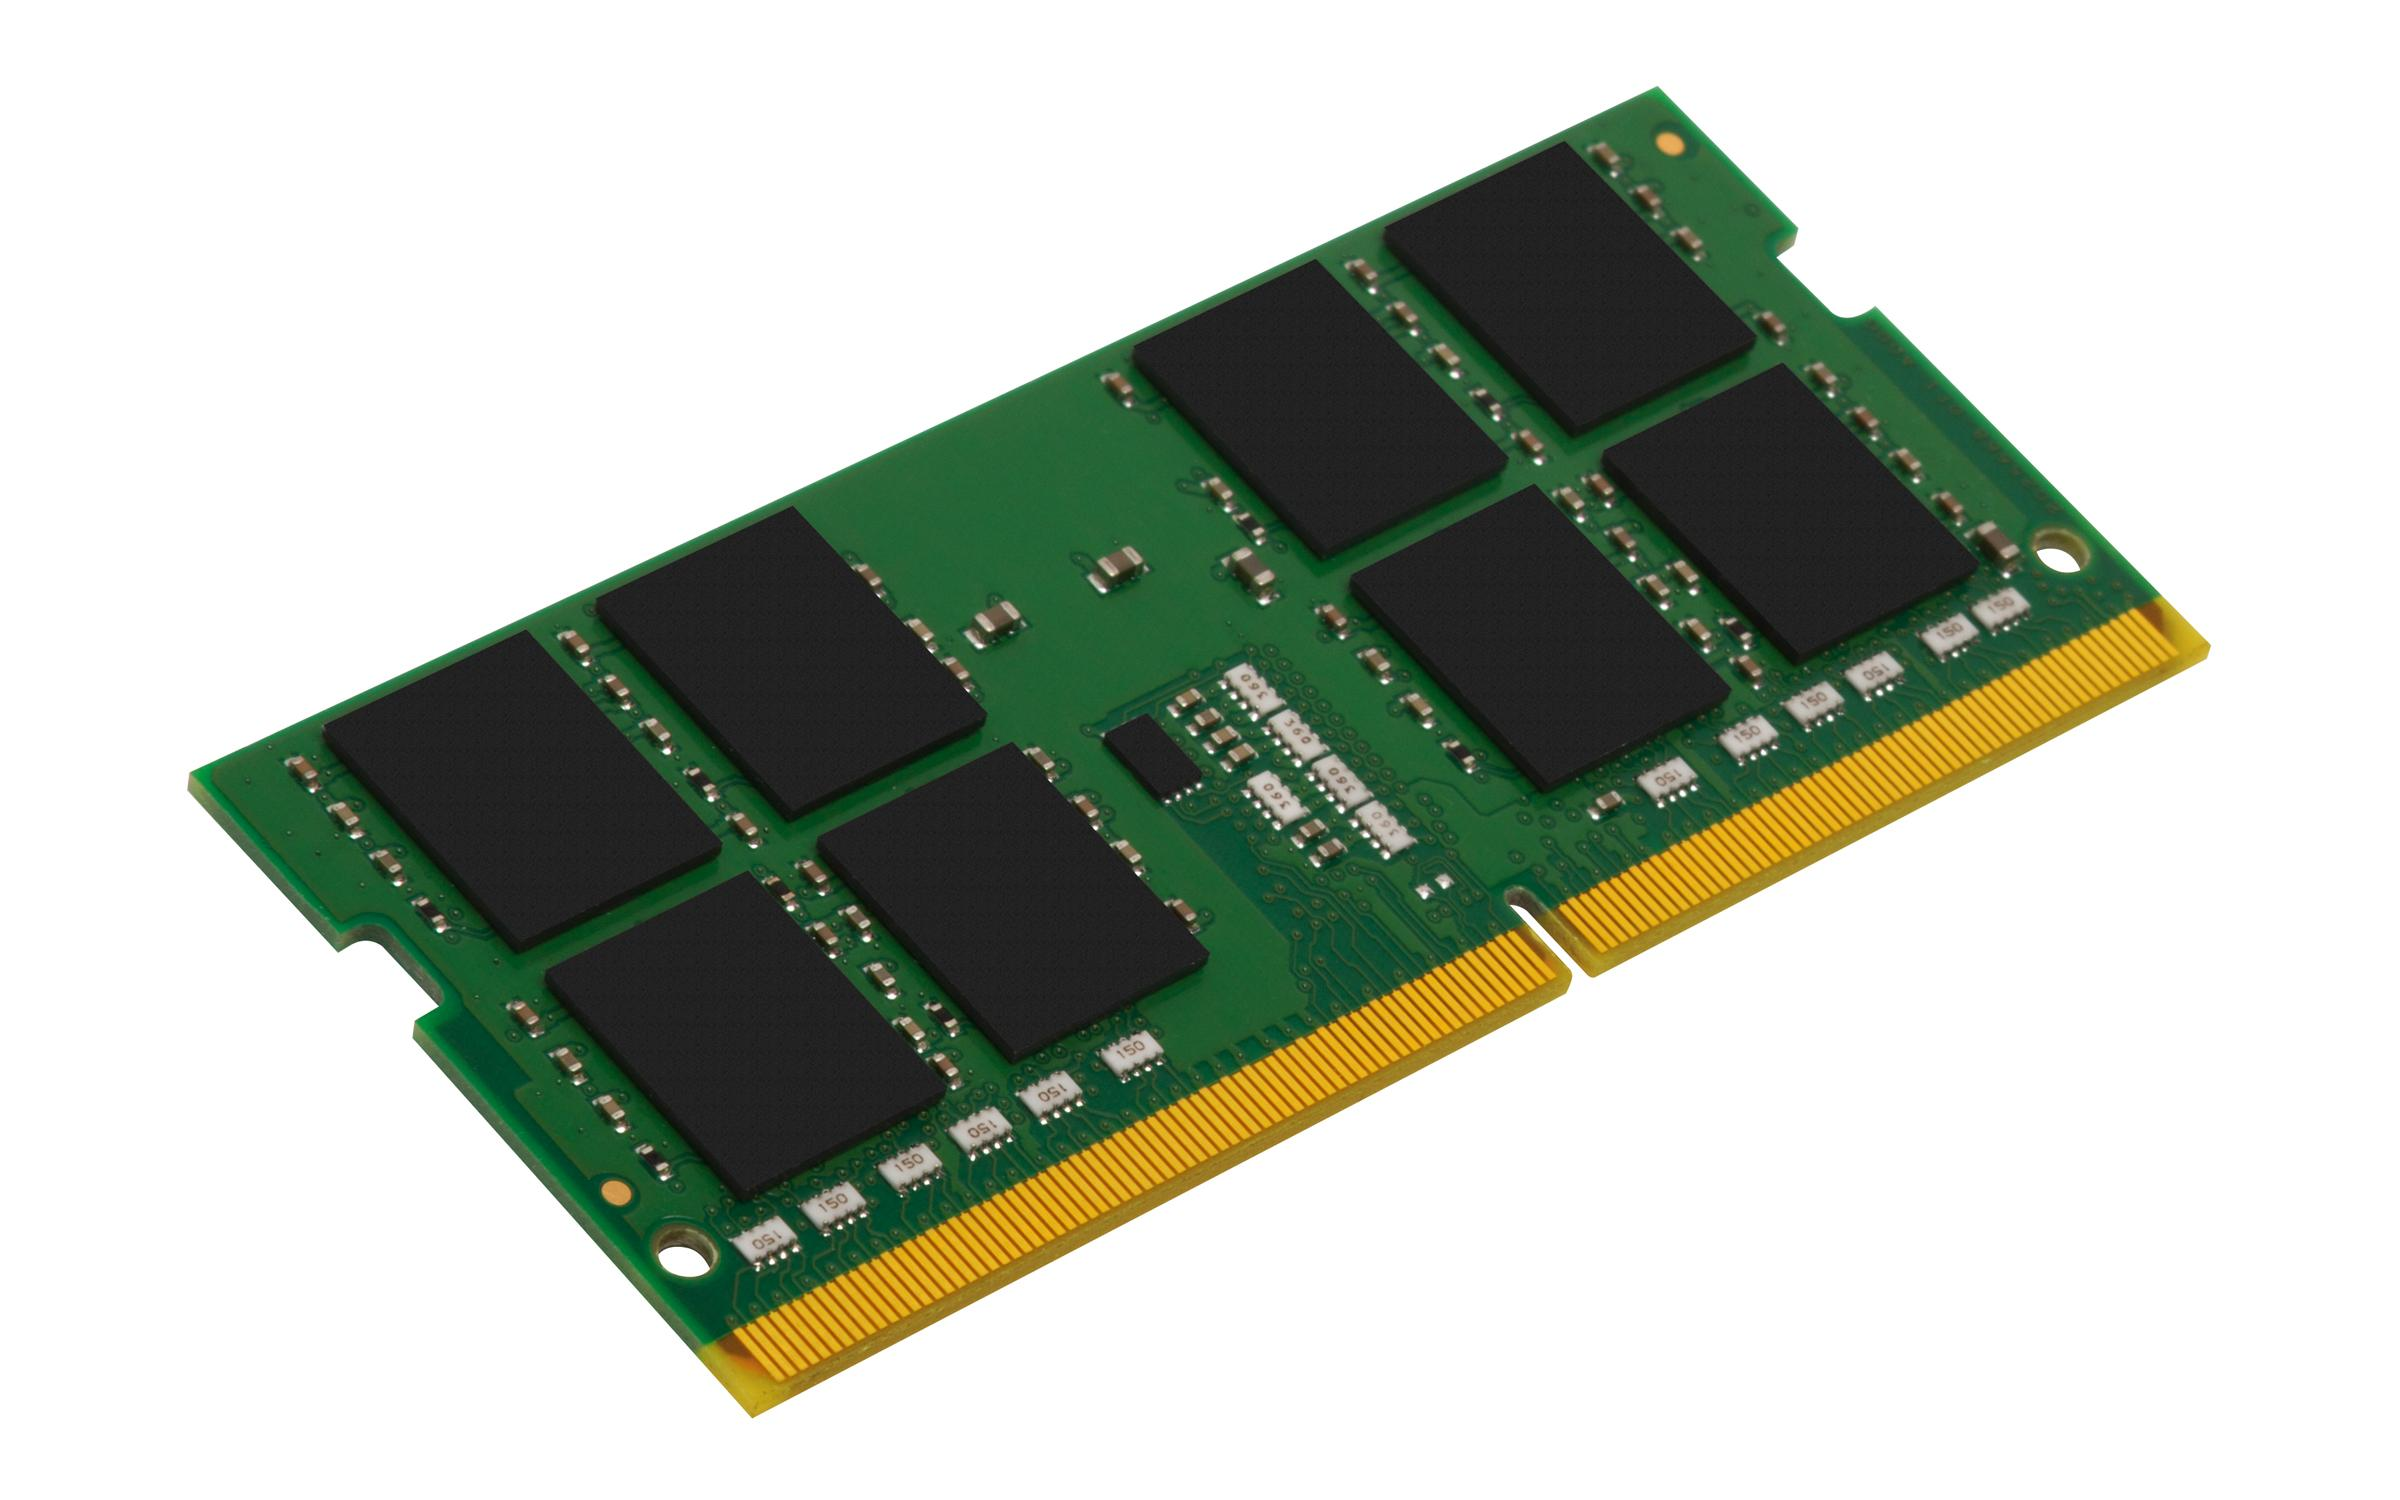 Памет Kingston 4GB, SODIMM, DDR4, PC4-25600, 3200MHz, CL22 KVR32S22S6/4-2